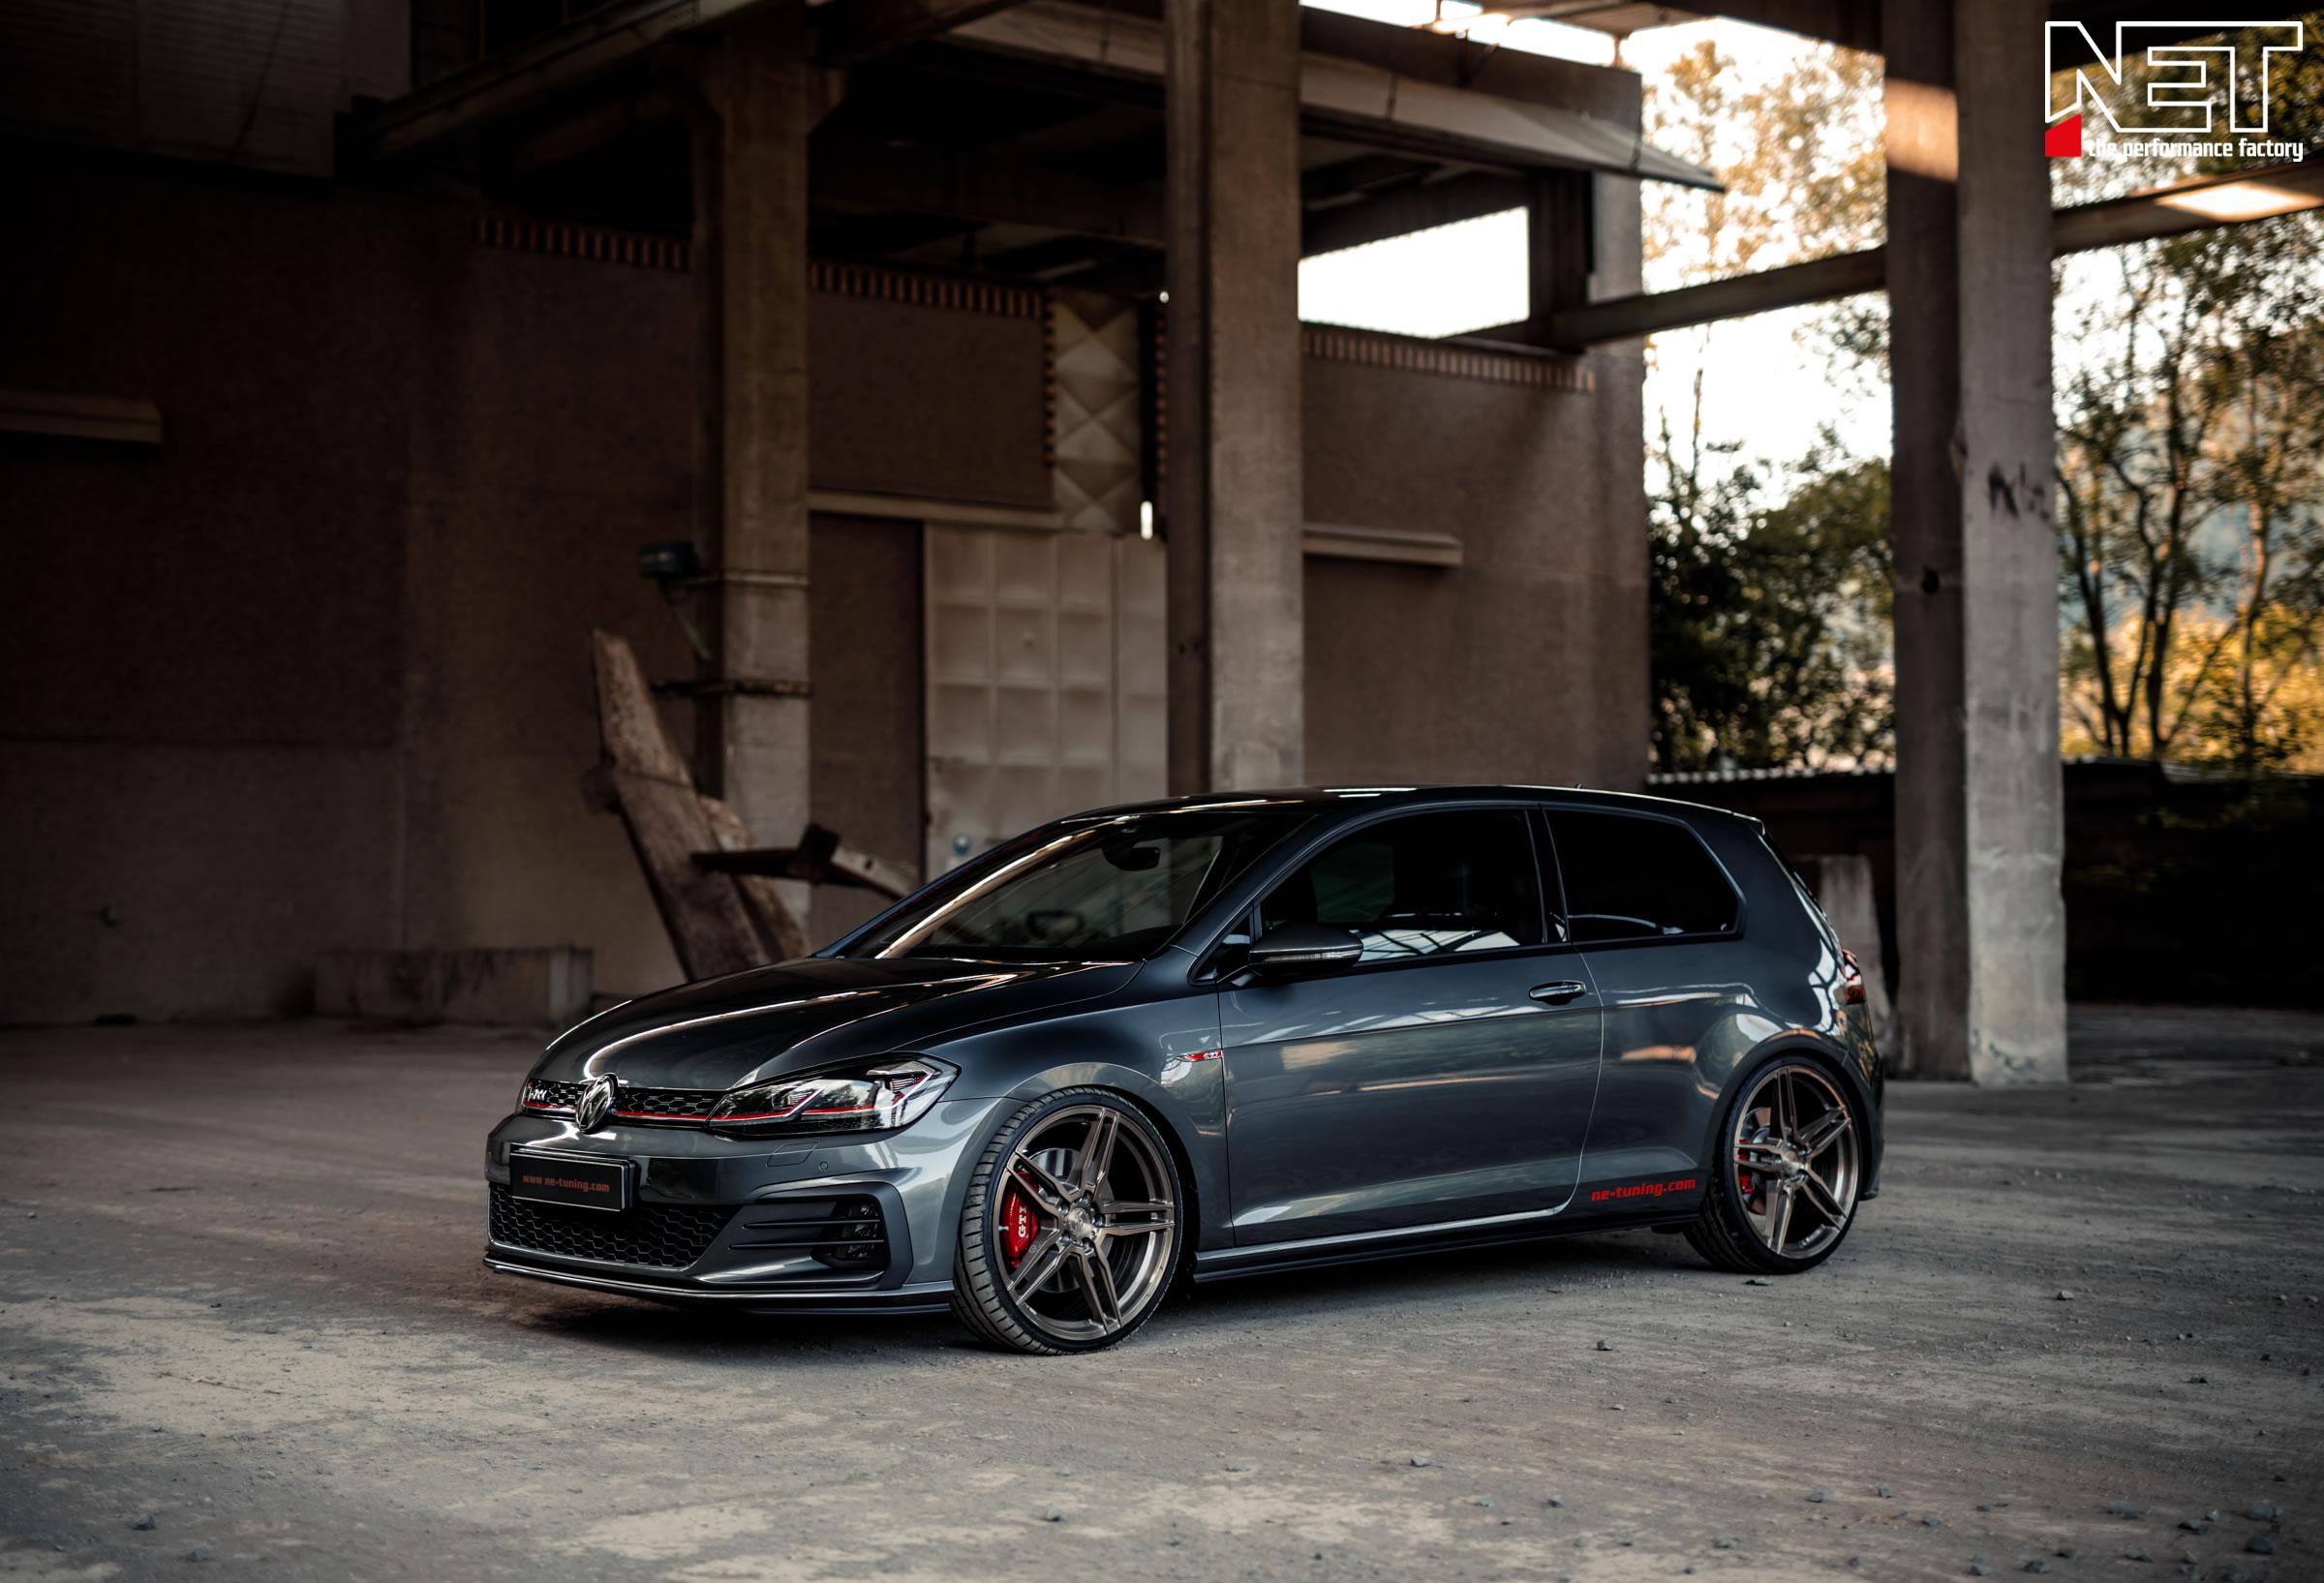 NET Galerie Car Tuning - VW Golf VII GTI Performance FL 18